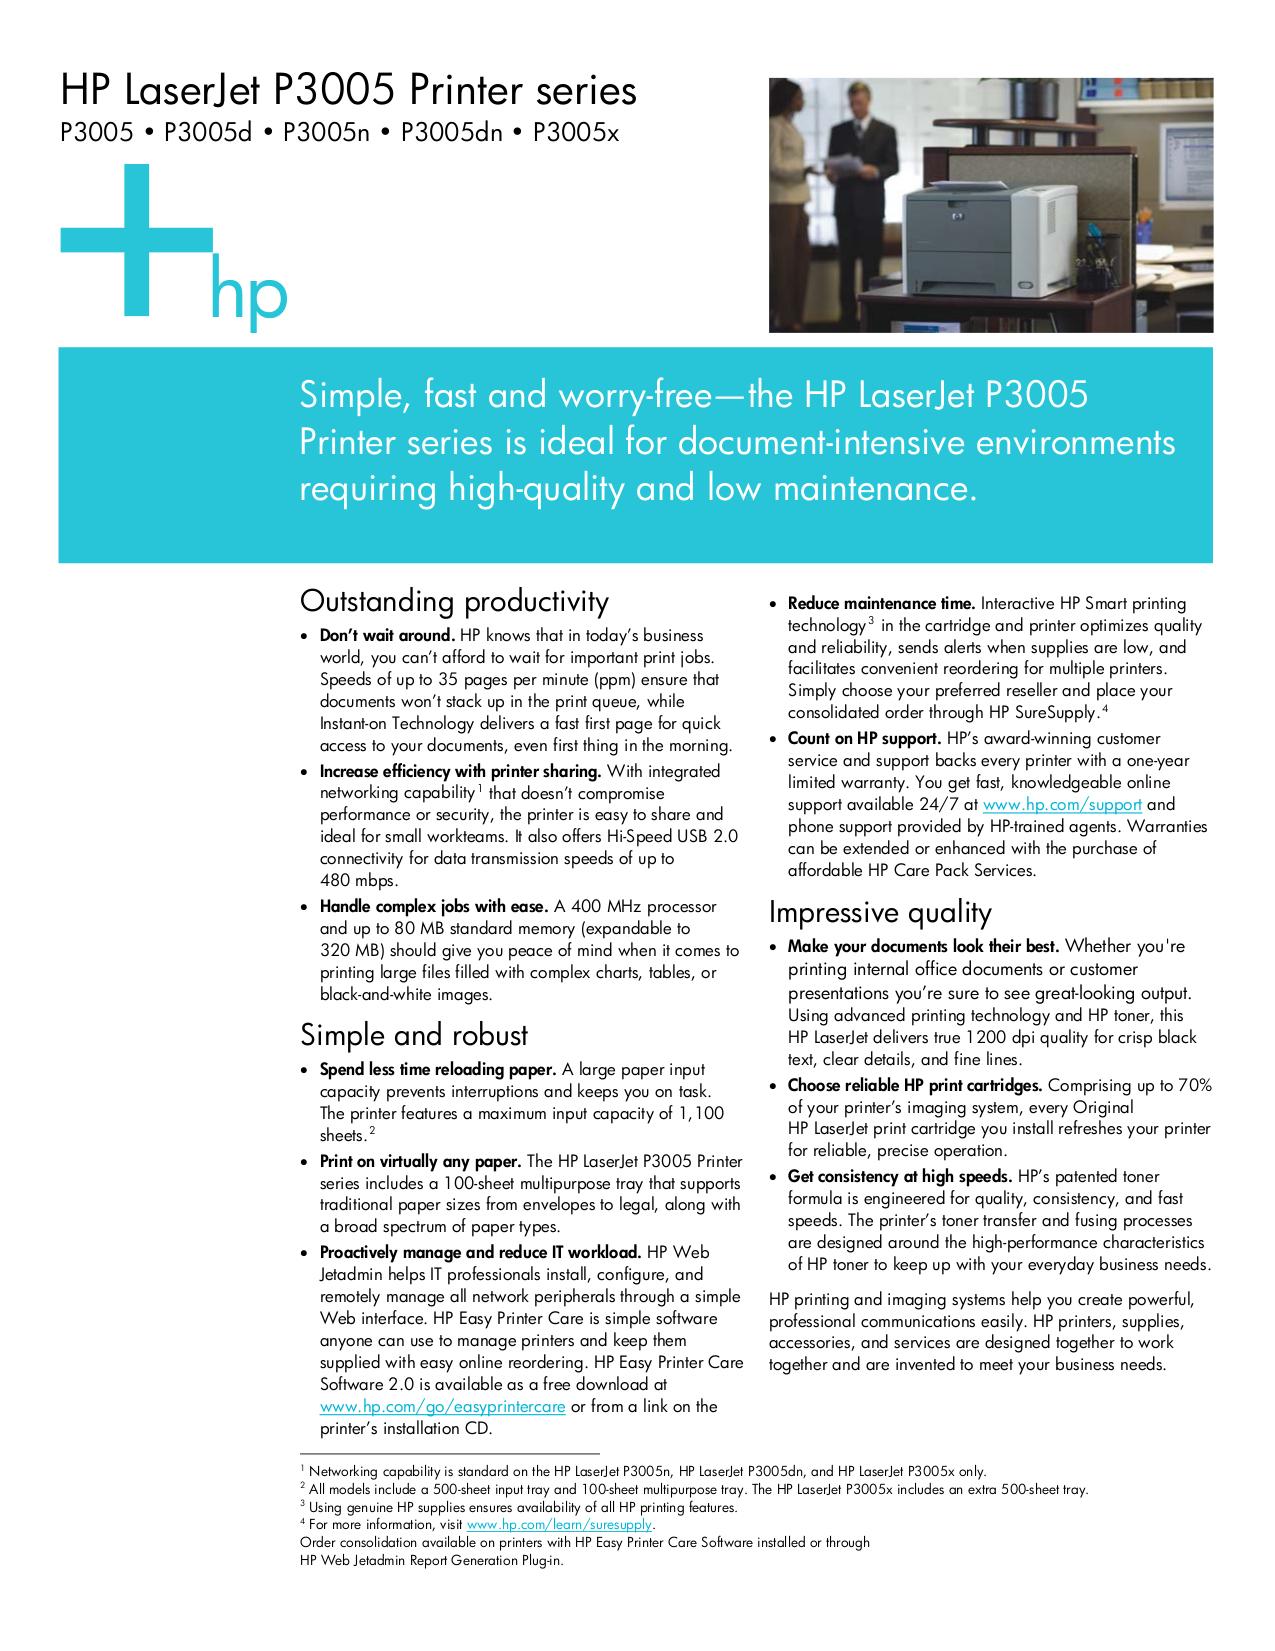 Download free pdf for HP Laserjet,Color Laserjet P3005dn Printer manual